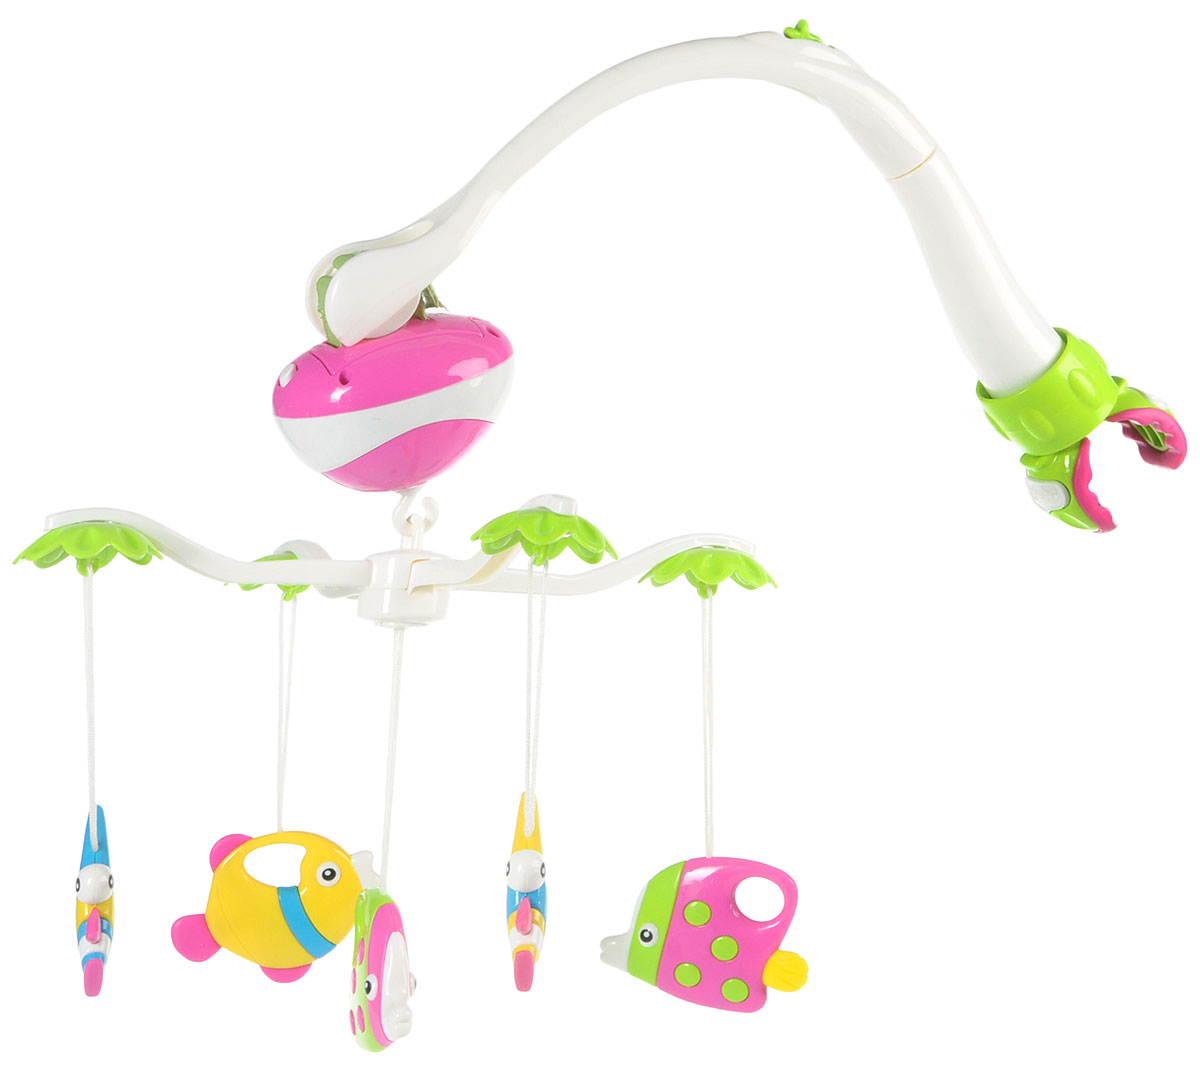 Veld-Co Музыкальная мобиль Рыбки, Shantou City Daxiang Plastic Toy Products Co., Ltd